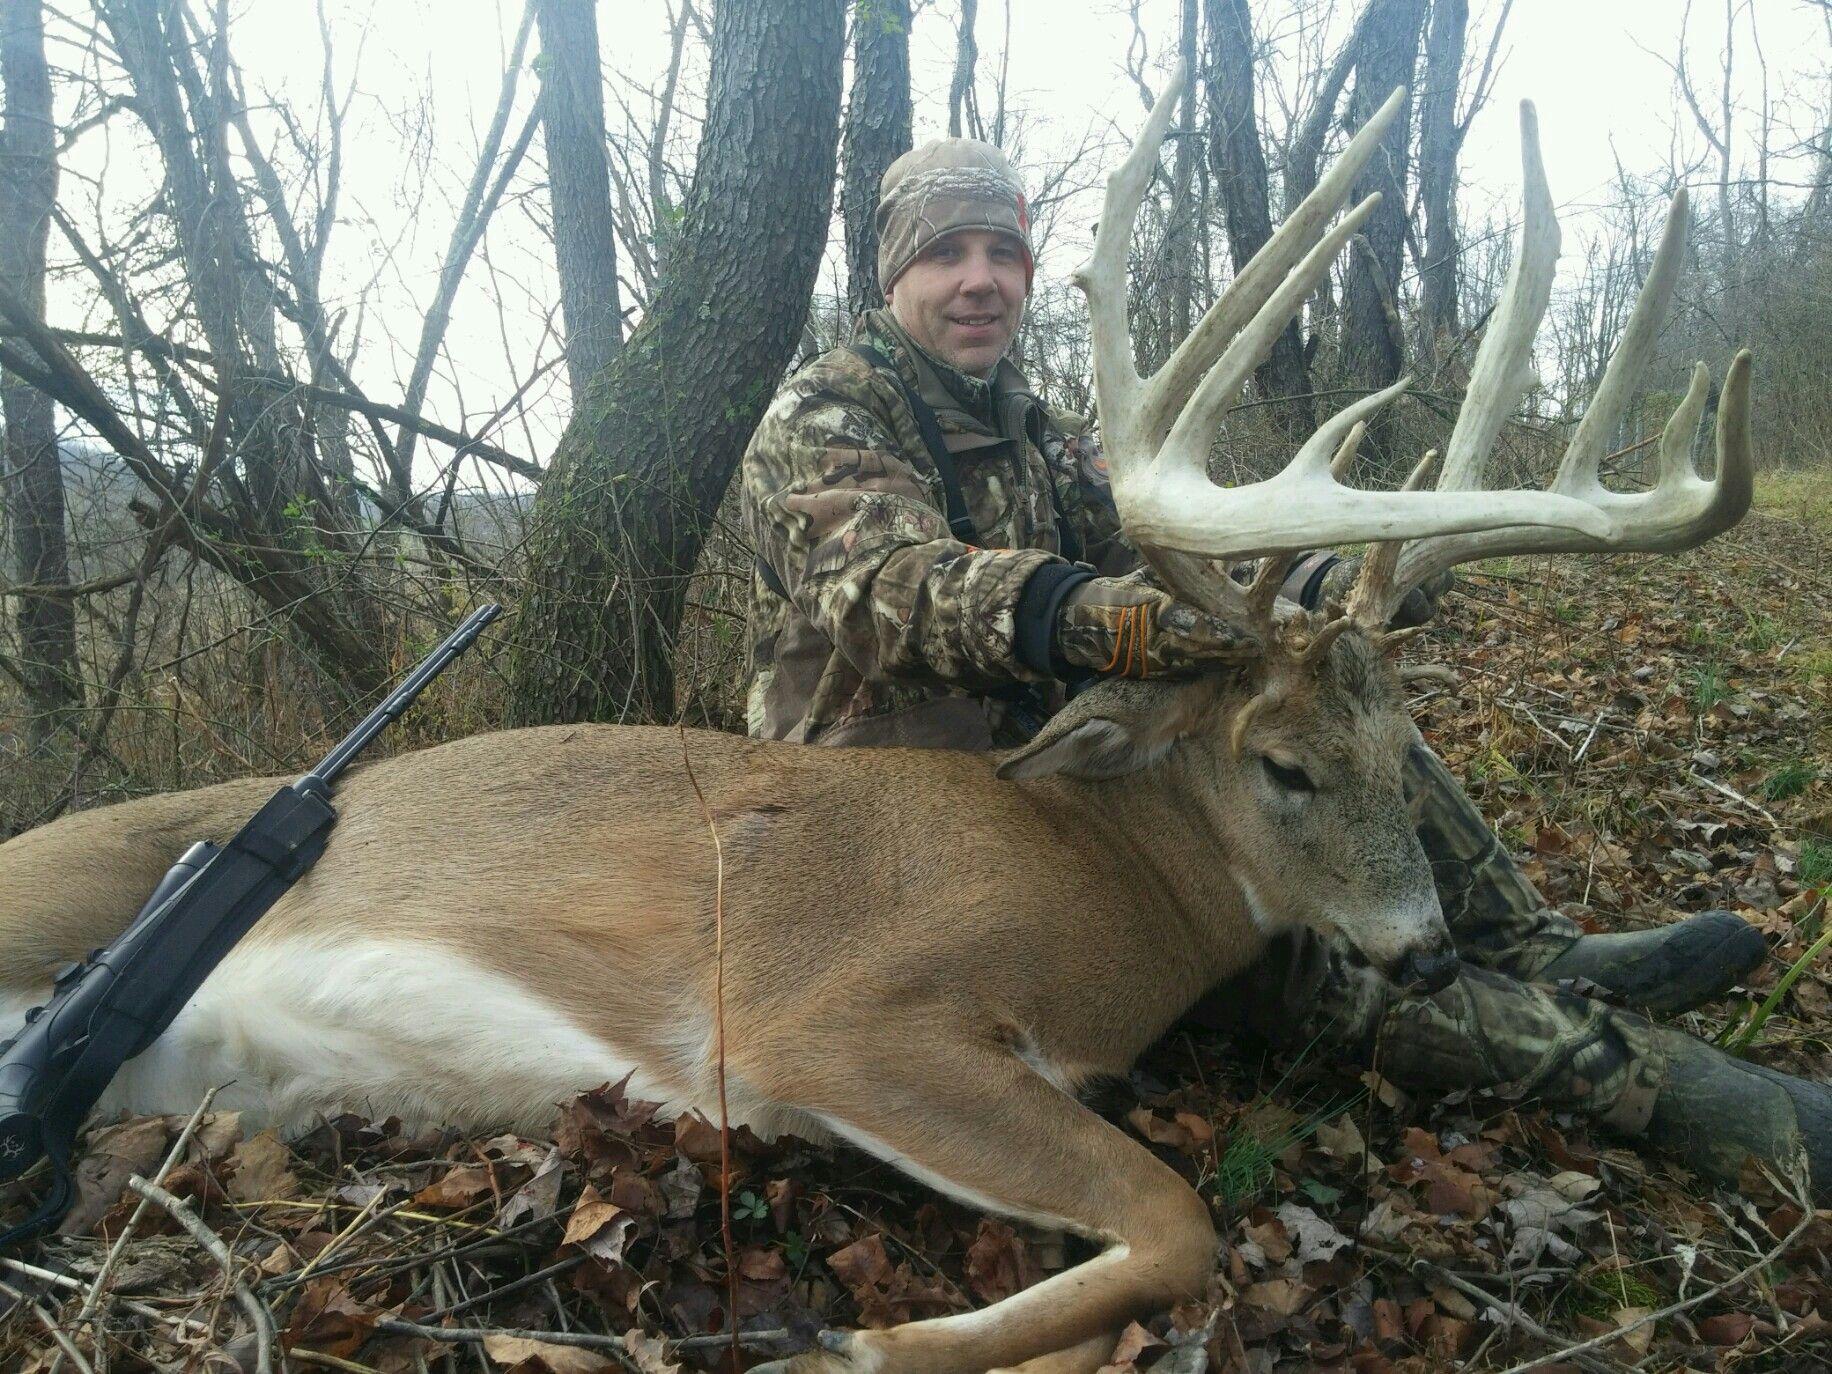 Monster Whitetail Hunt Whitetail Hunting Deer Hunting Whitetail Deer Hunting